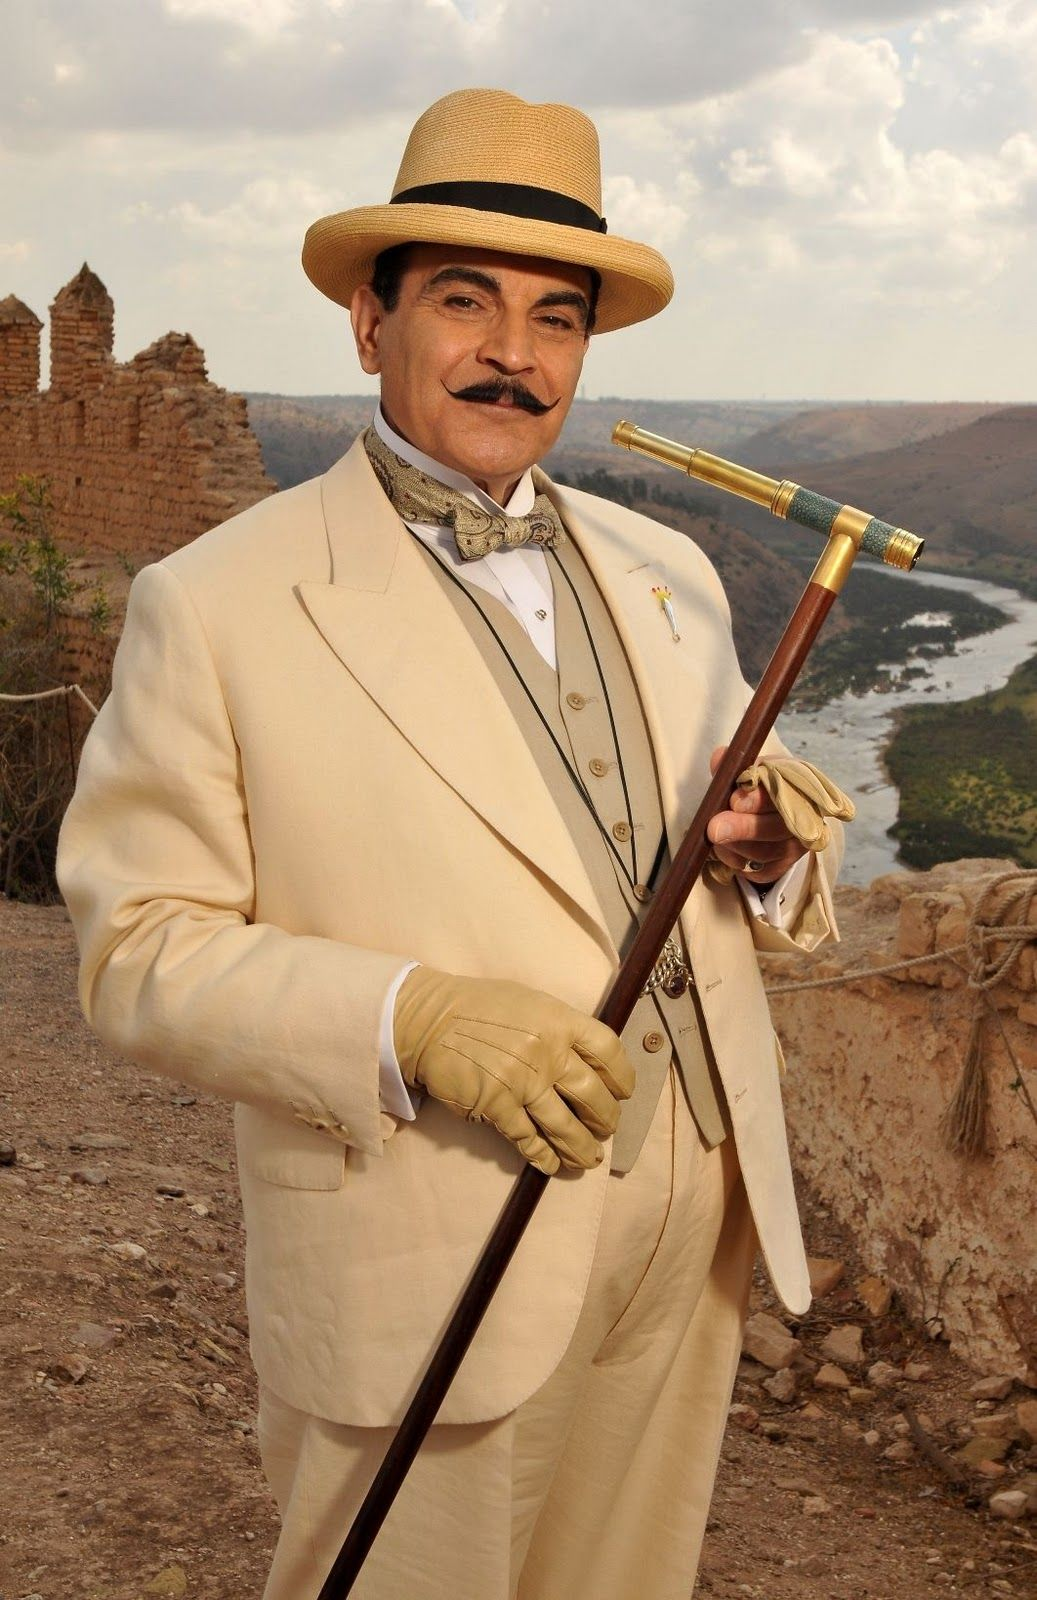 agatha christie poirot  David Suchet as Hercule Poirot in